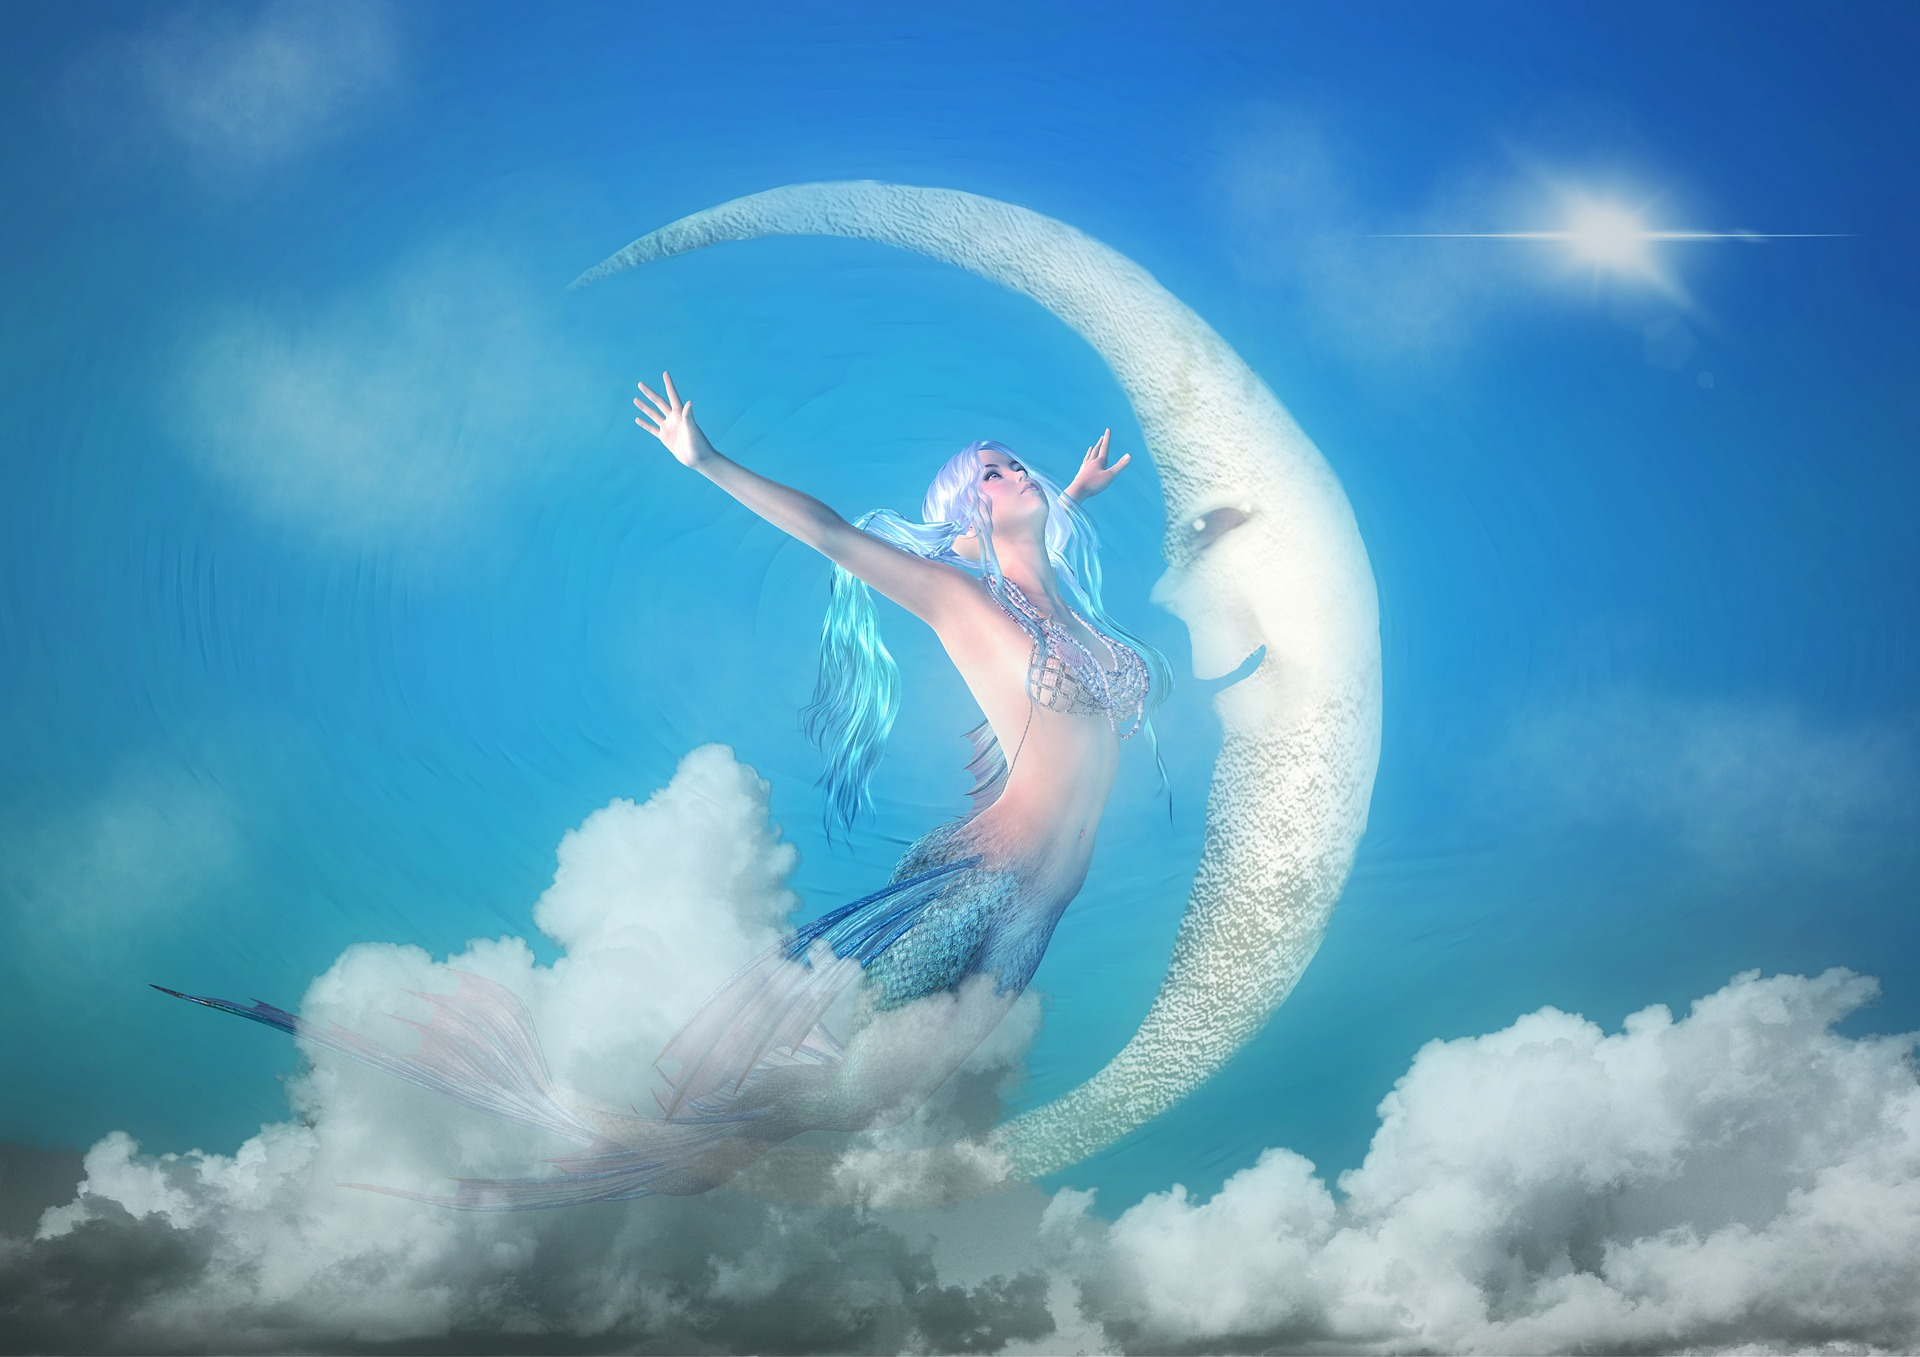 luna noua in balanta - sfatulparintilor.ro - pixabay_com - blue-2061782_1920